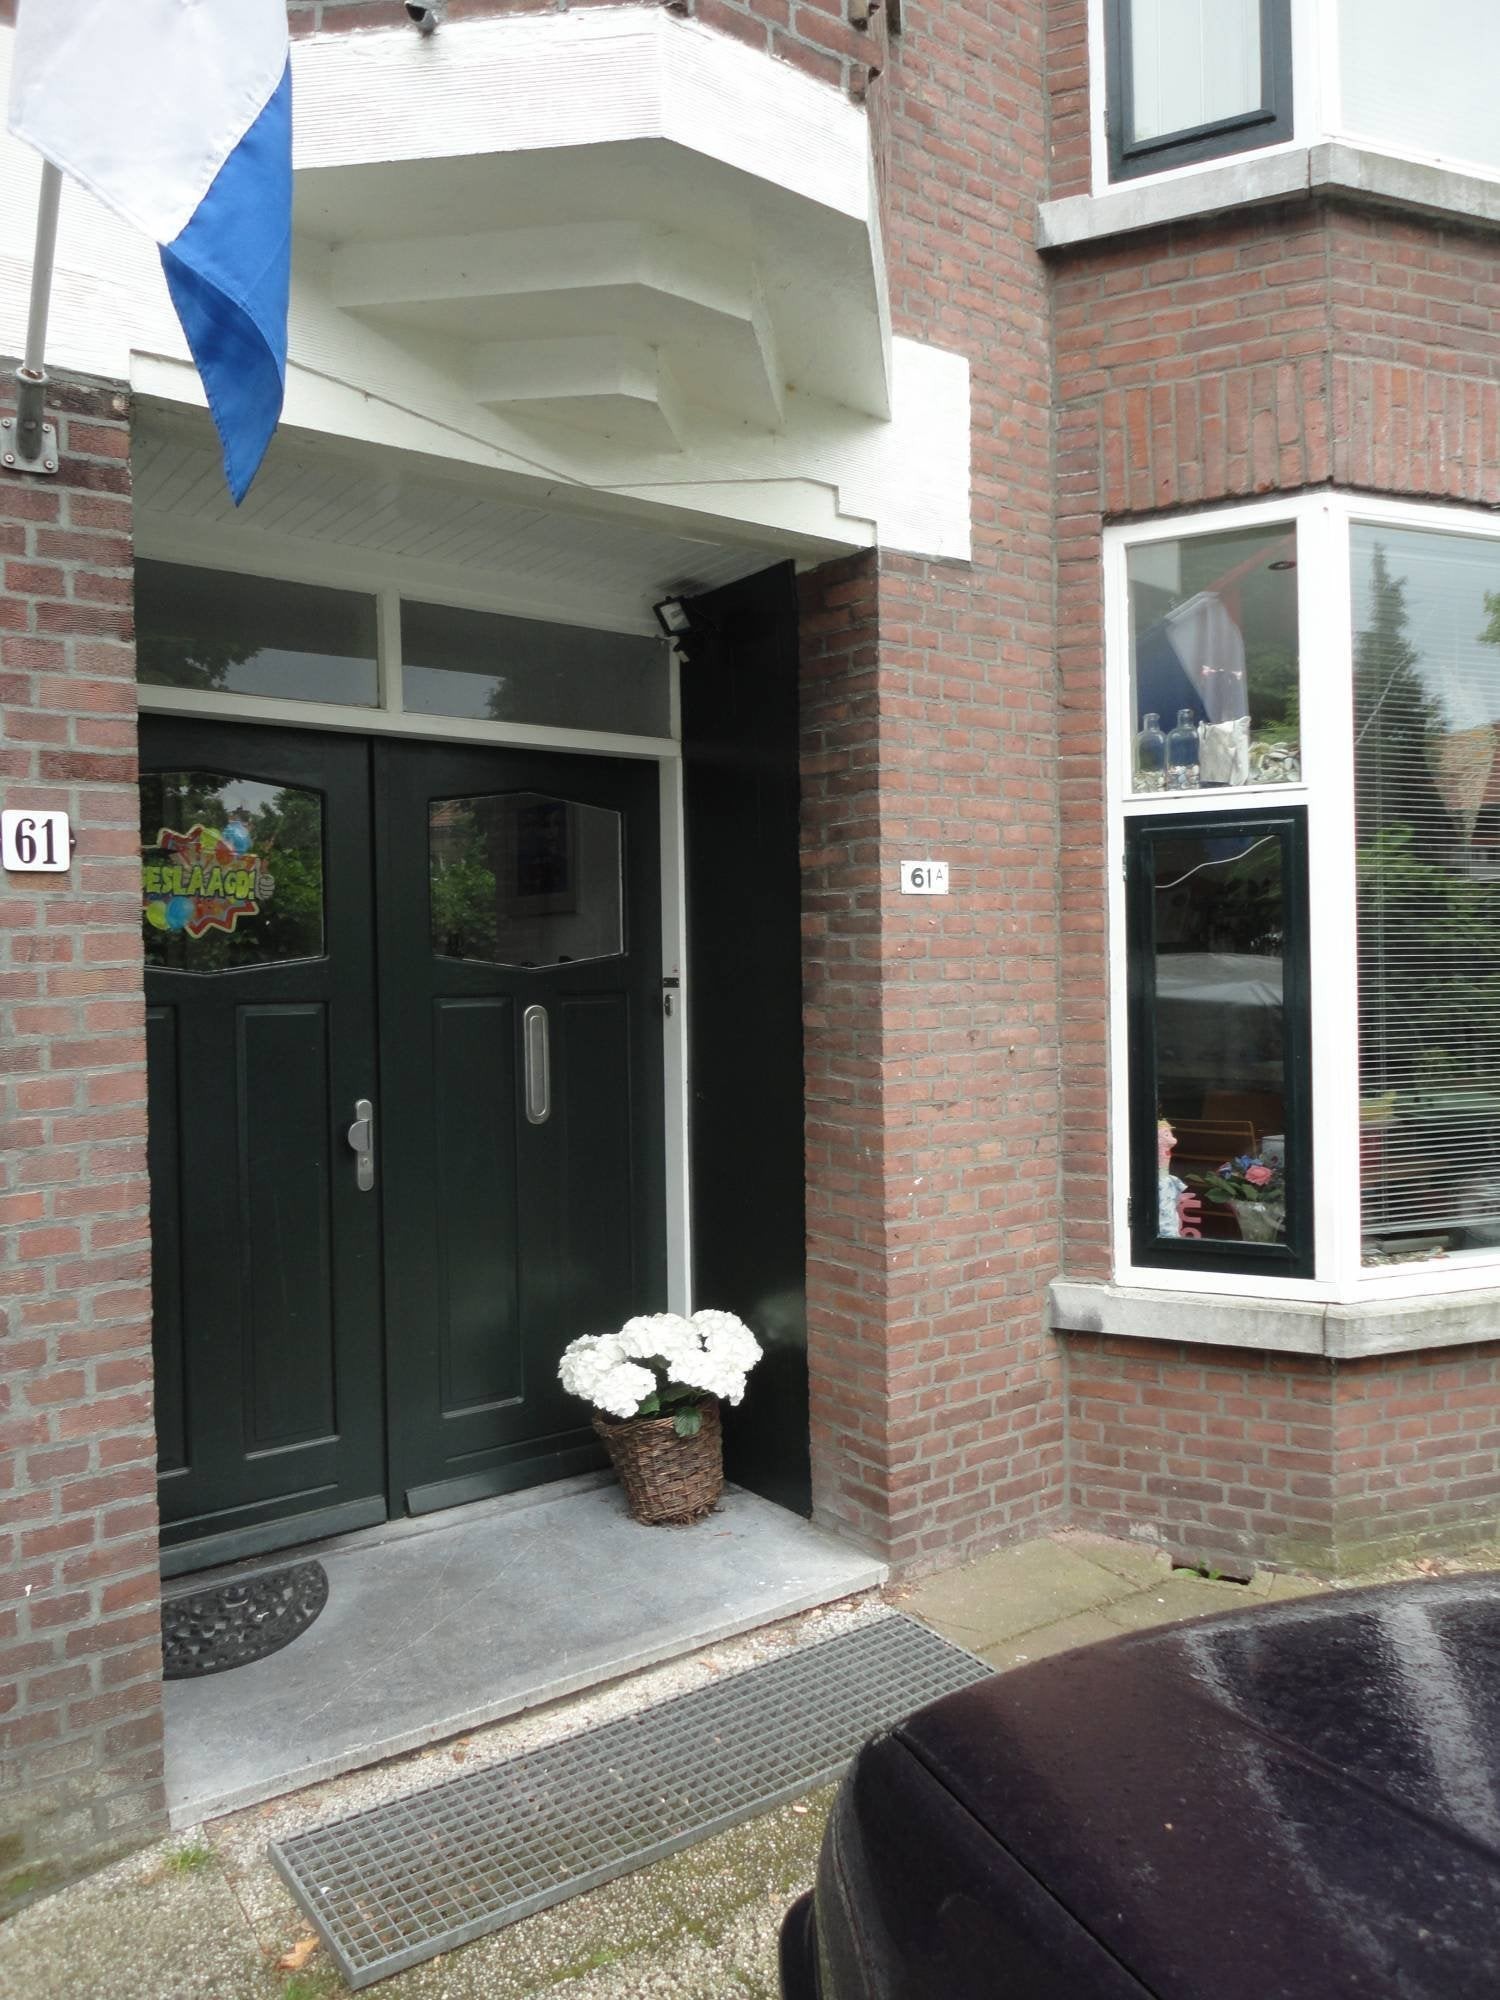 Rotterdam, Berglustlaan